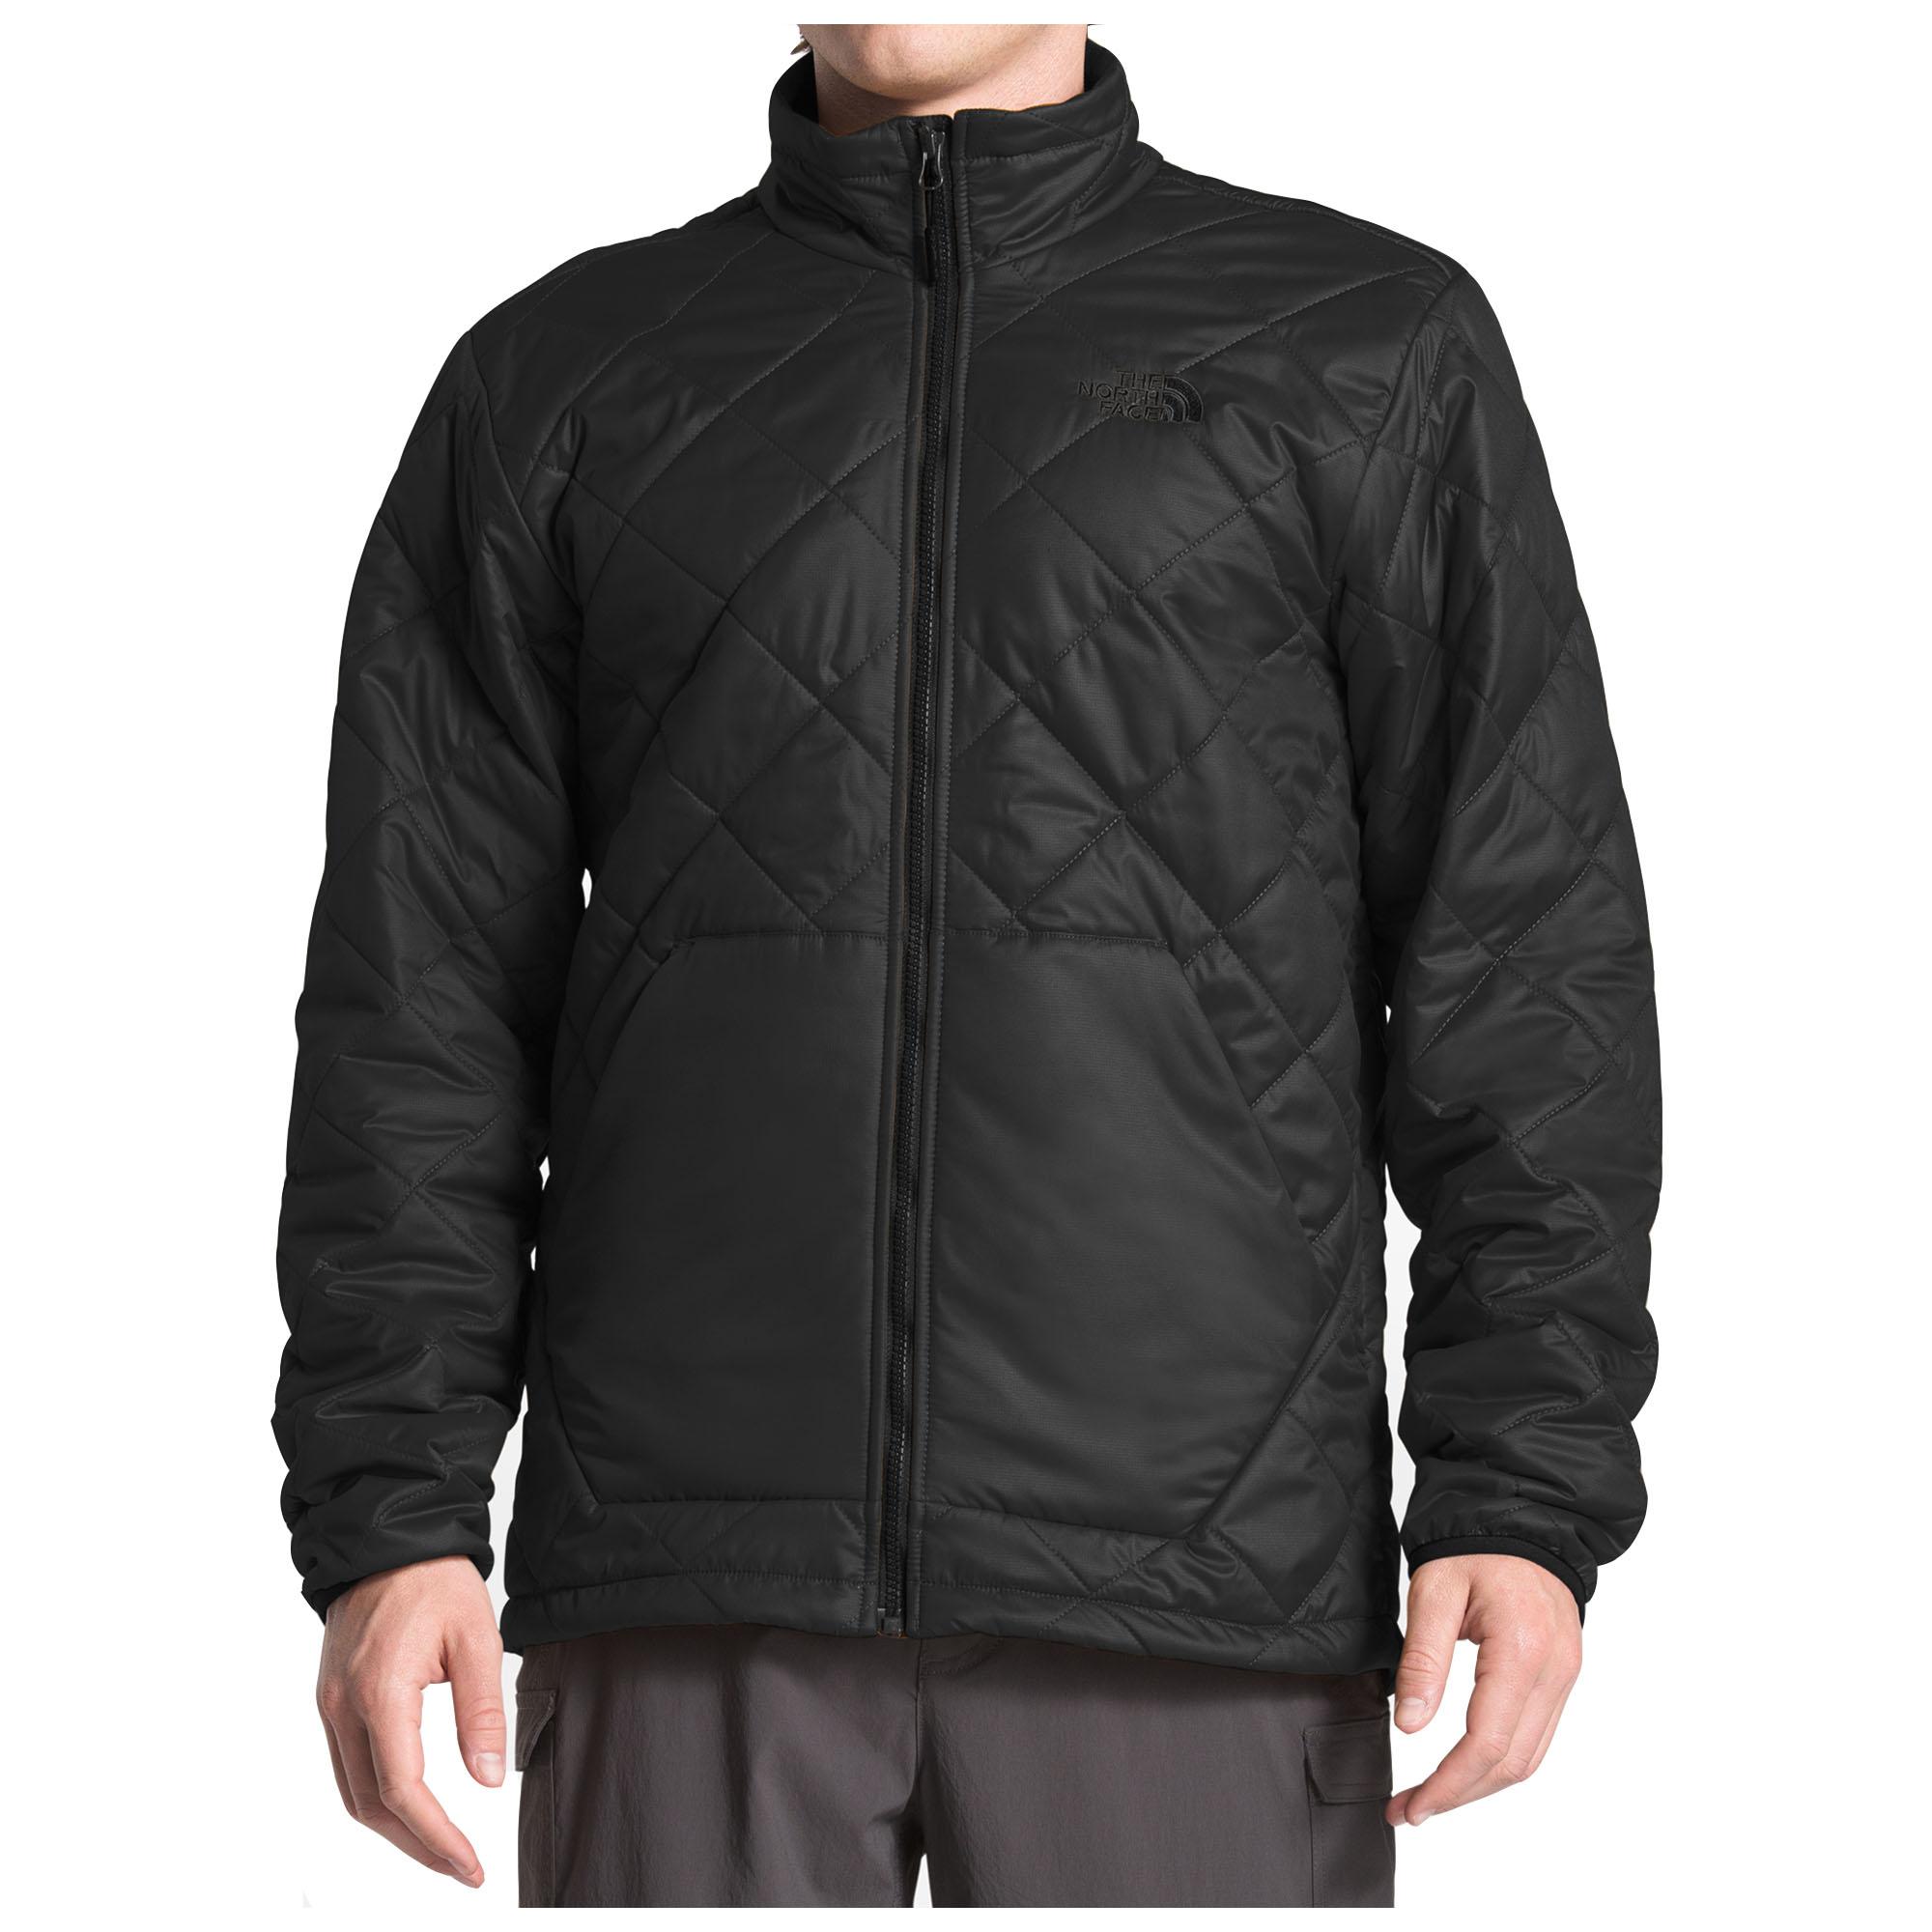 c3c0ef64a The North Face Men's Cervas Jacket